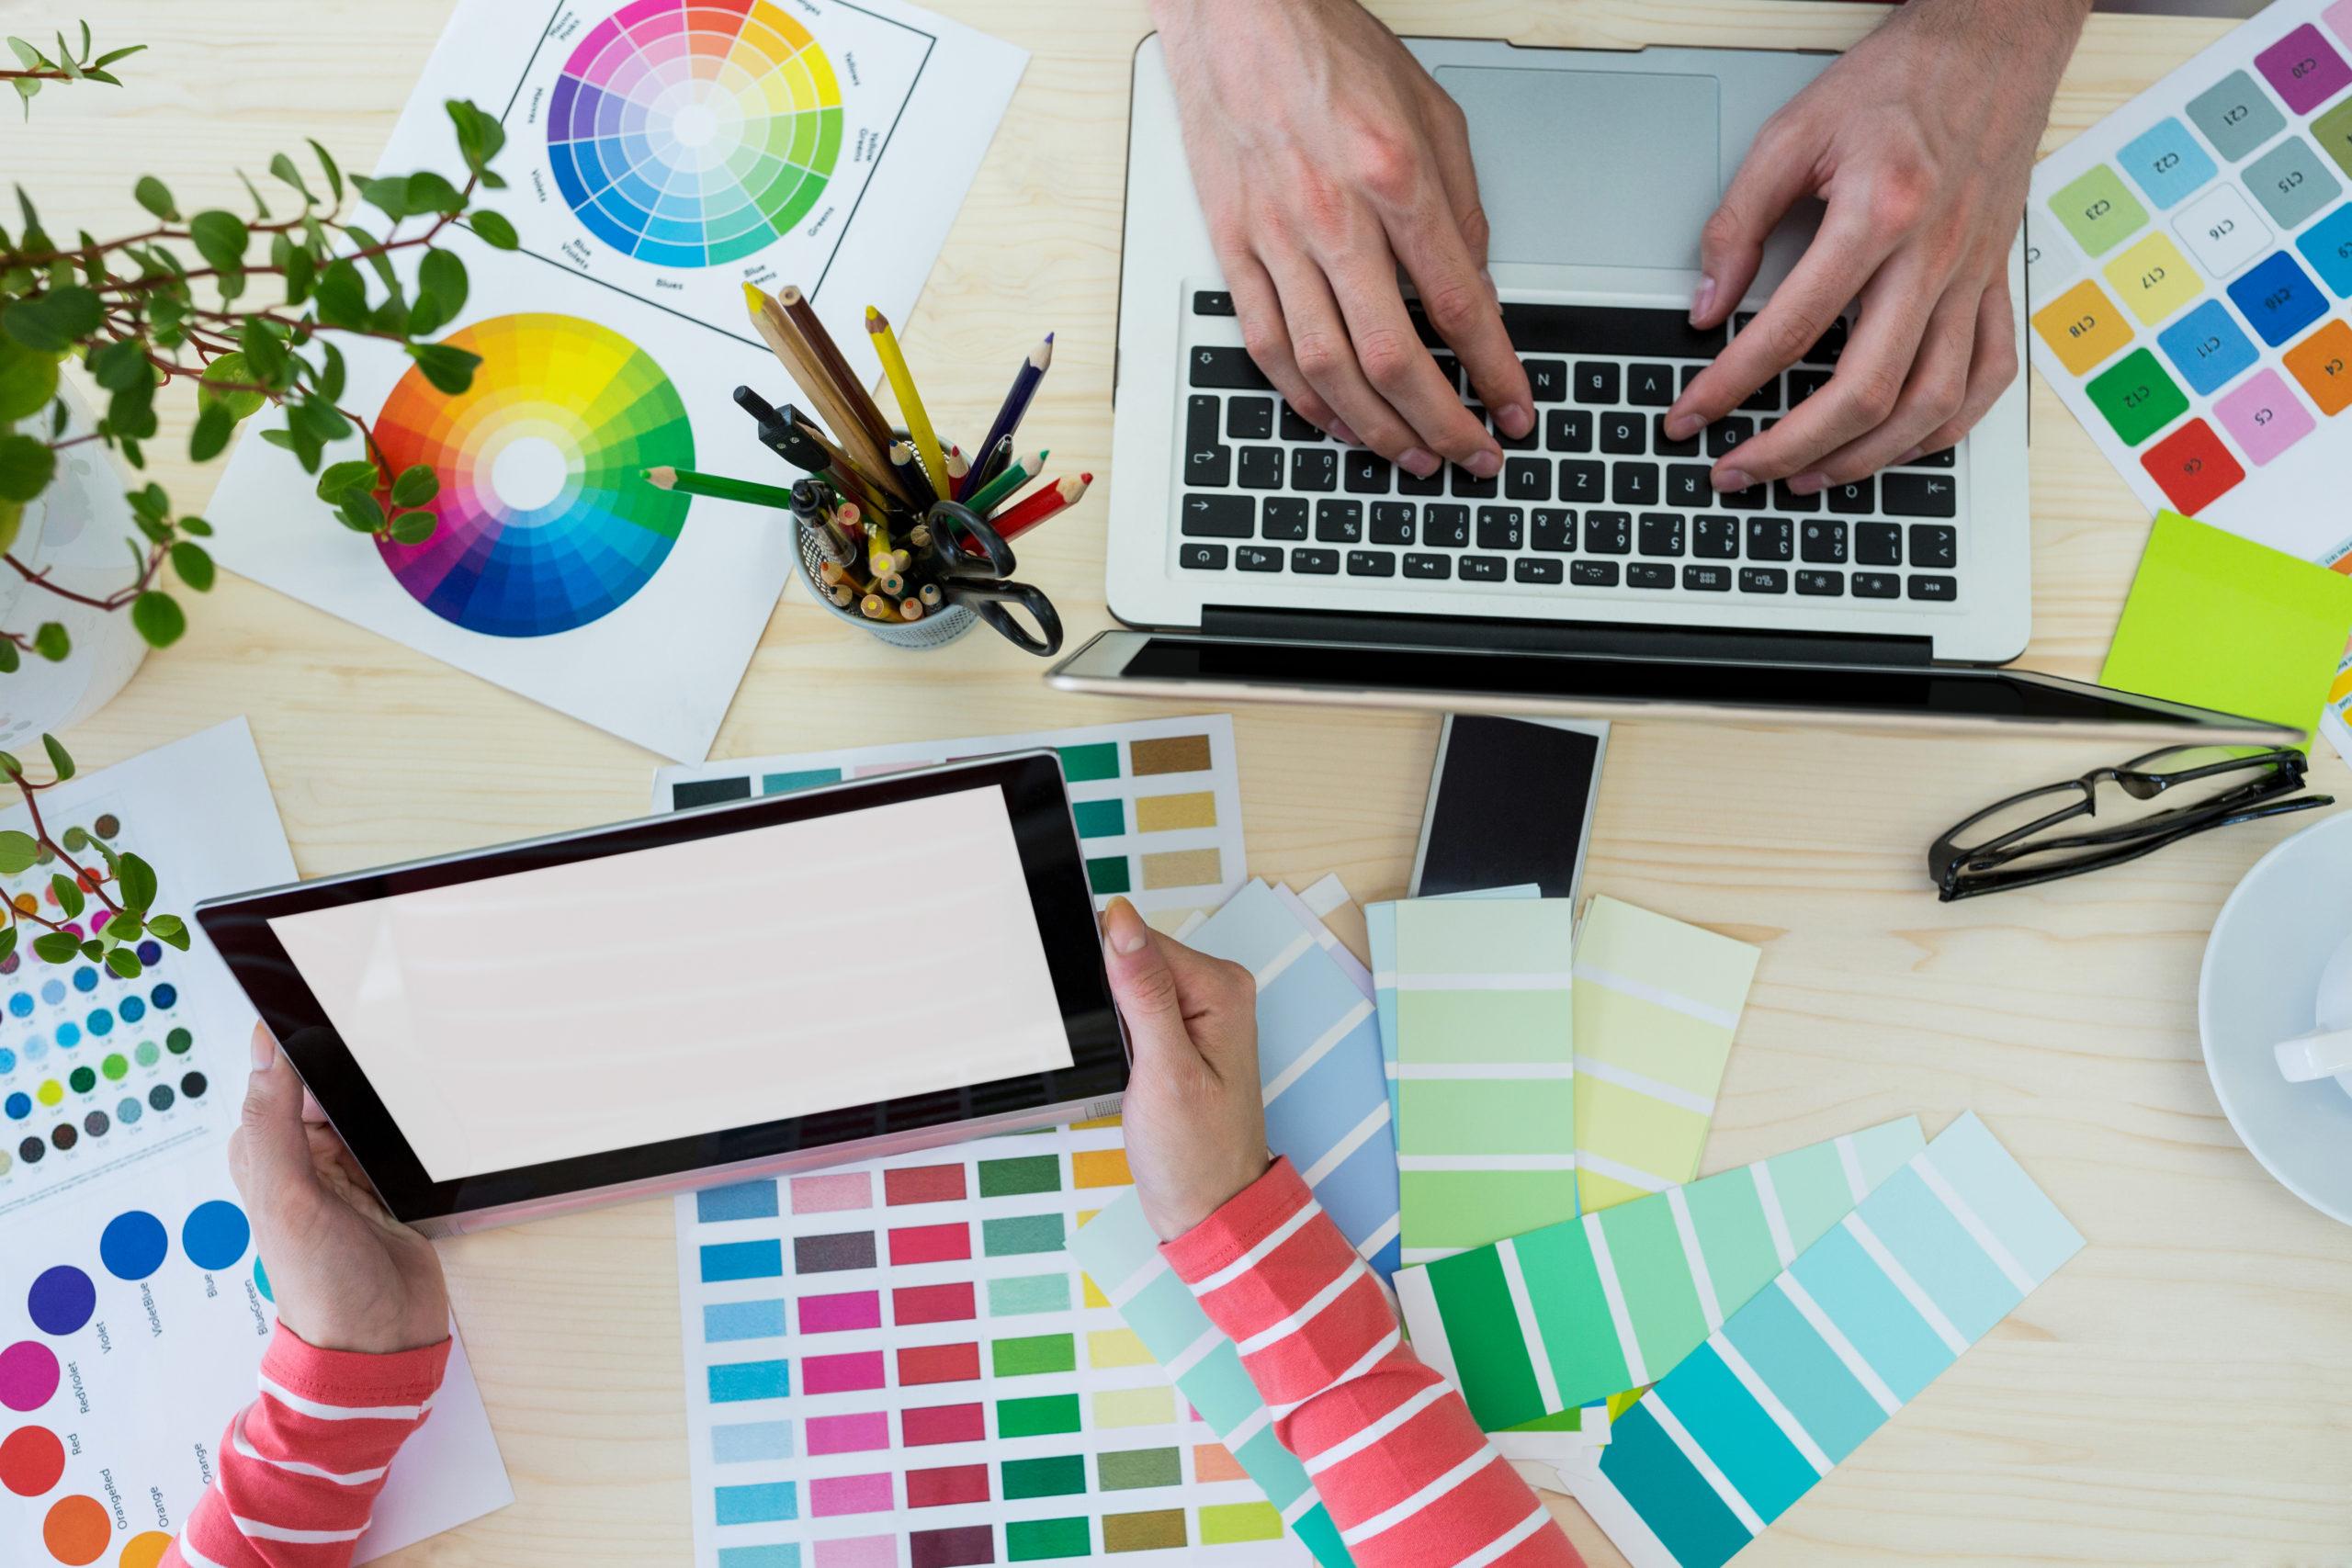 Blink communication - agence graphique - conception graphique - création graphique